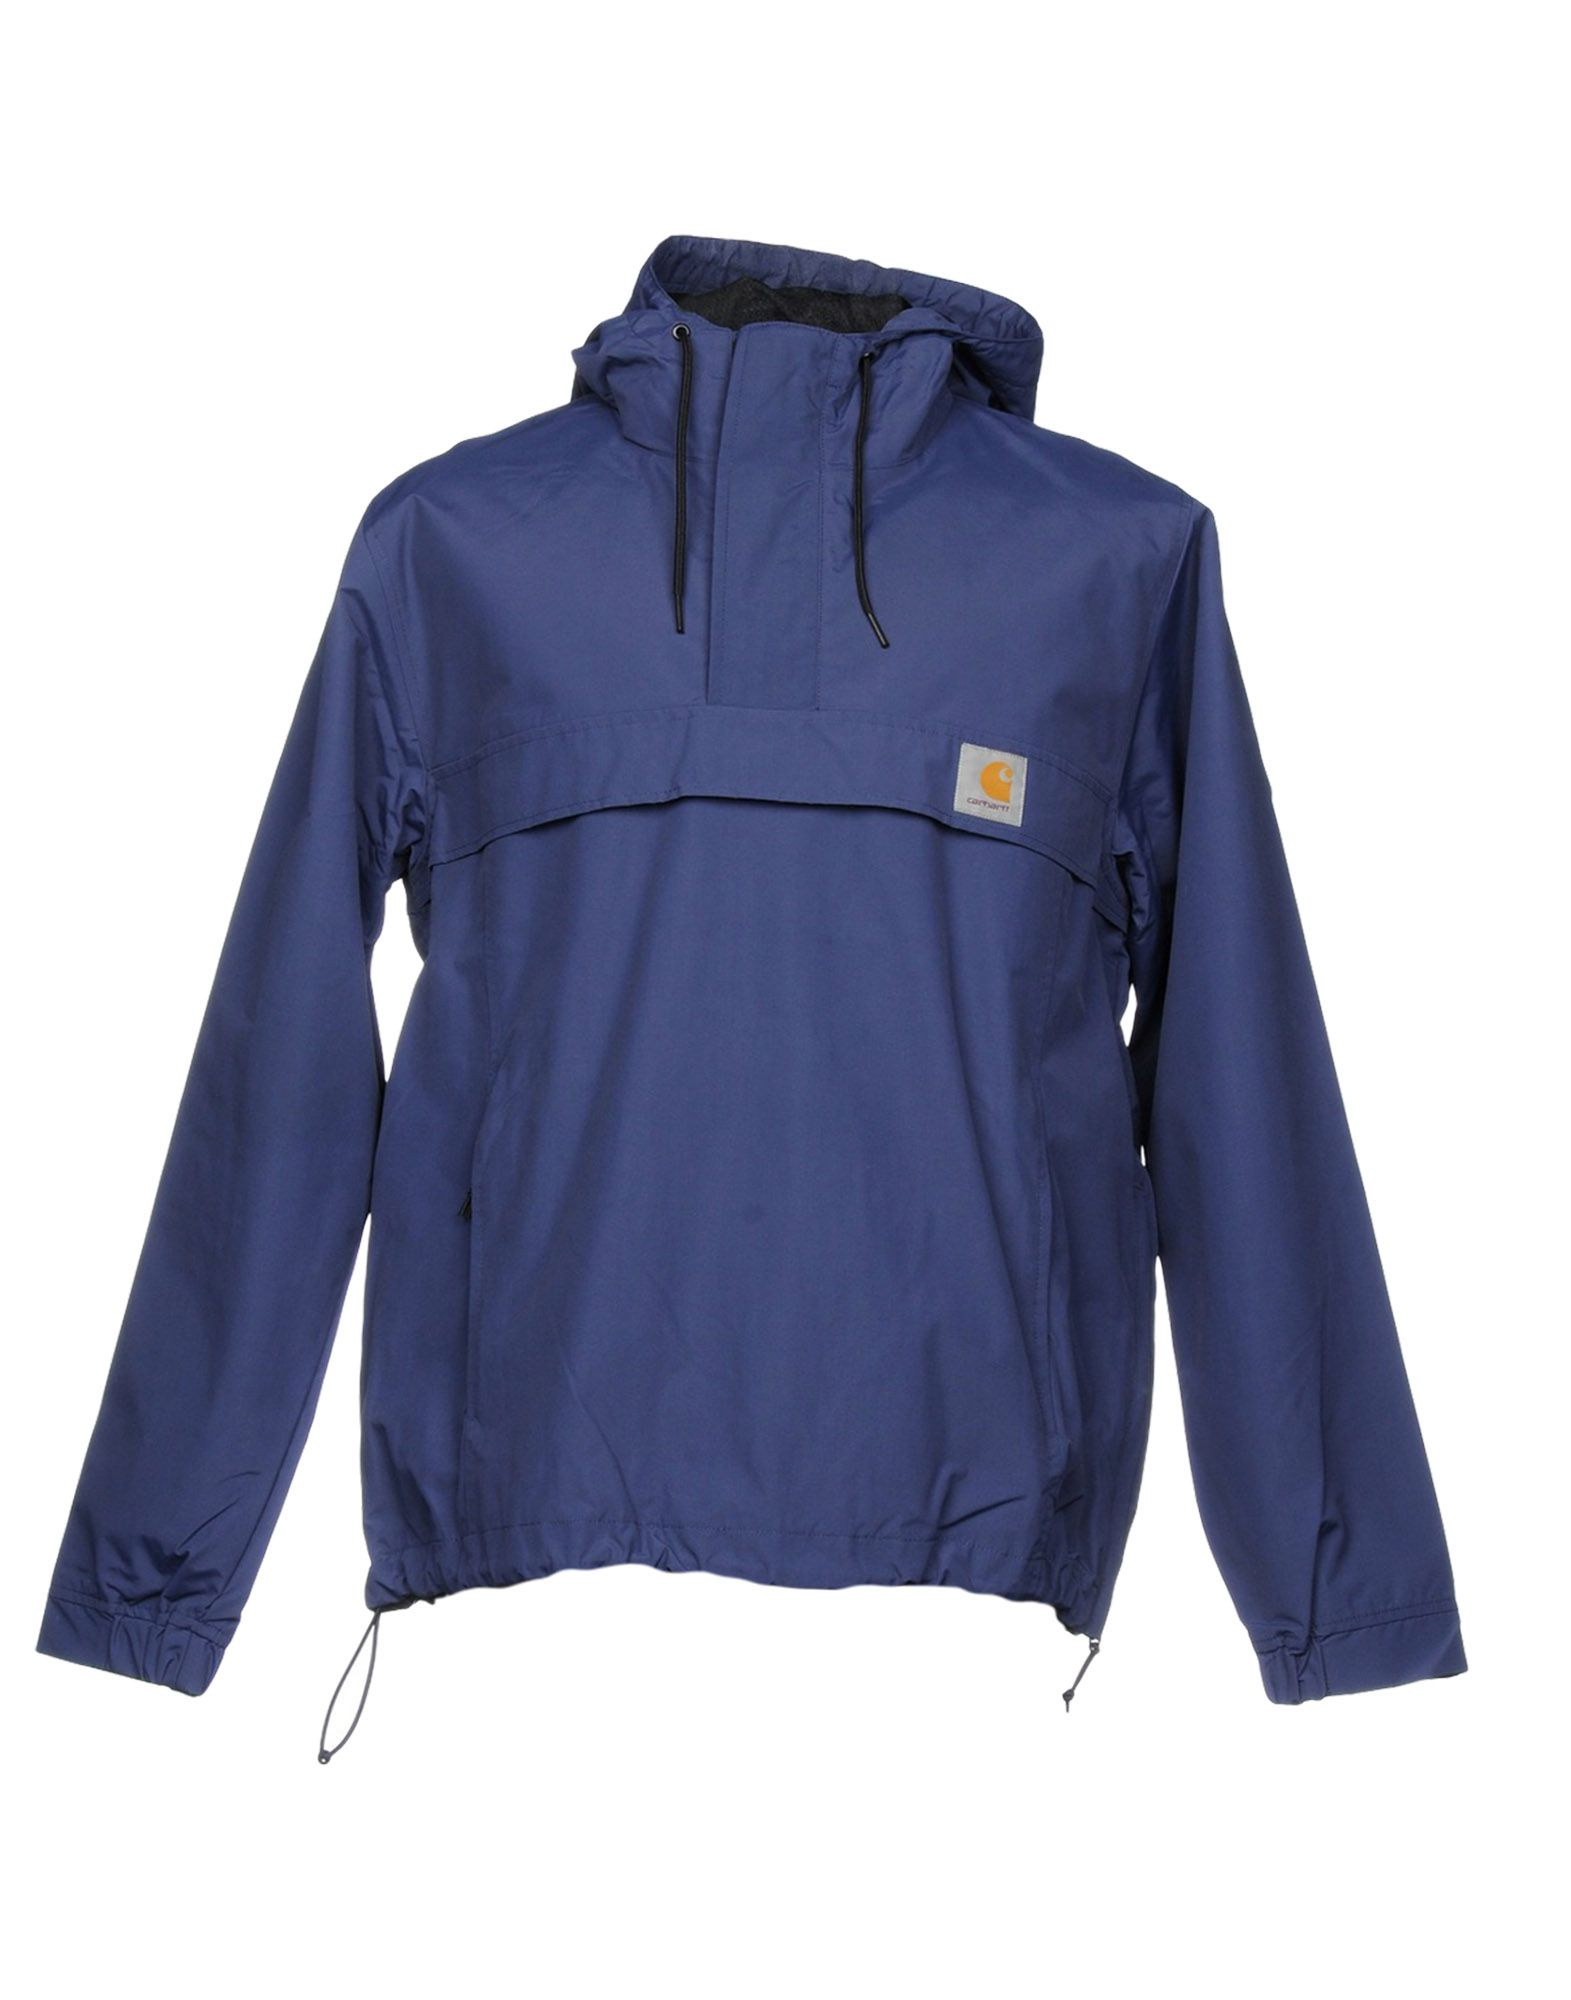 af086ec89f Carhartt Jacket - Men Carhartt Jackets online on YOOX United States ...